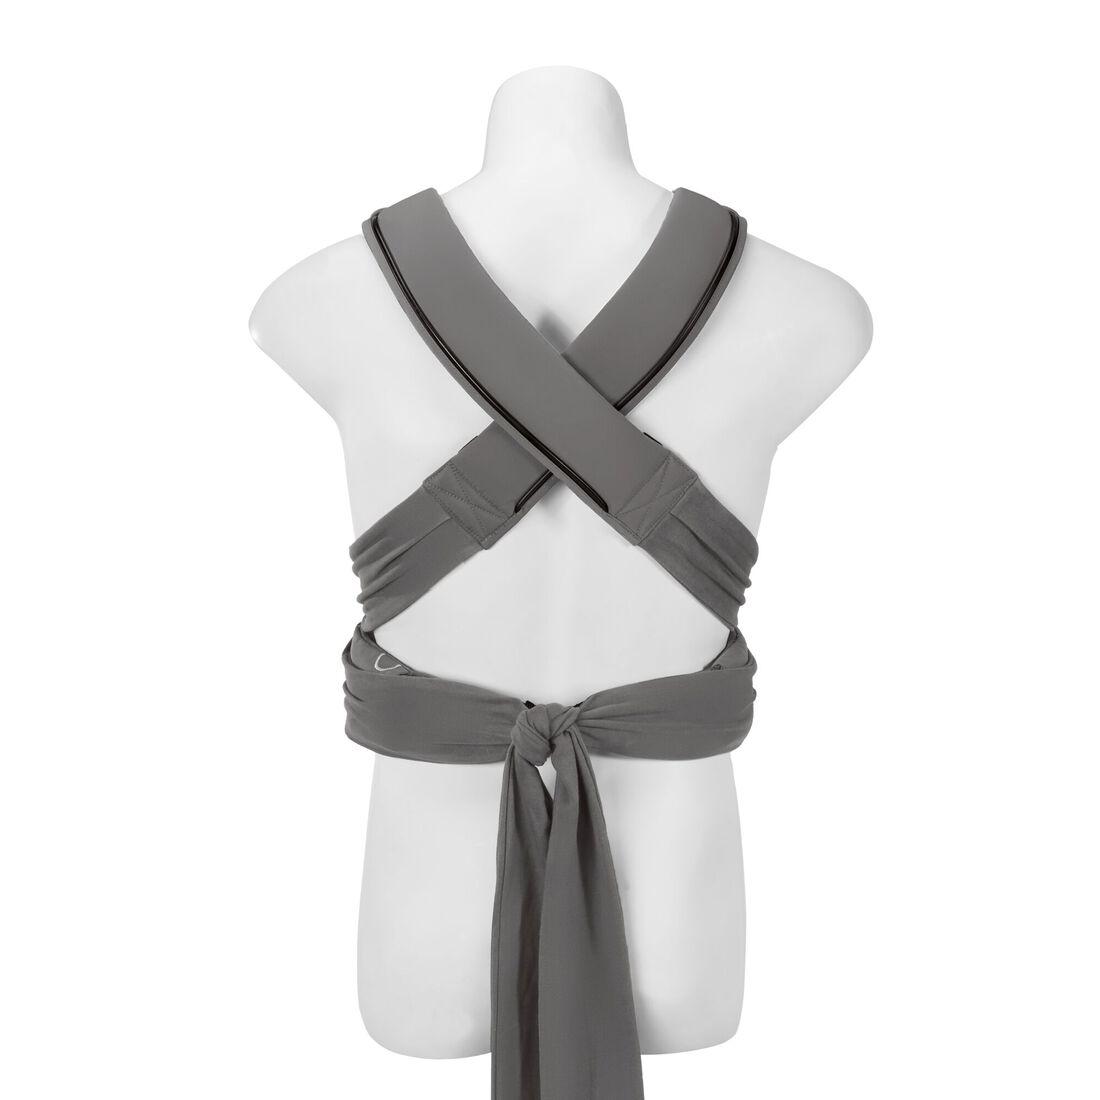 CYBEX Yema Tie - Soho Grey in Soho Grey large Bild 3